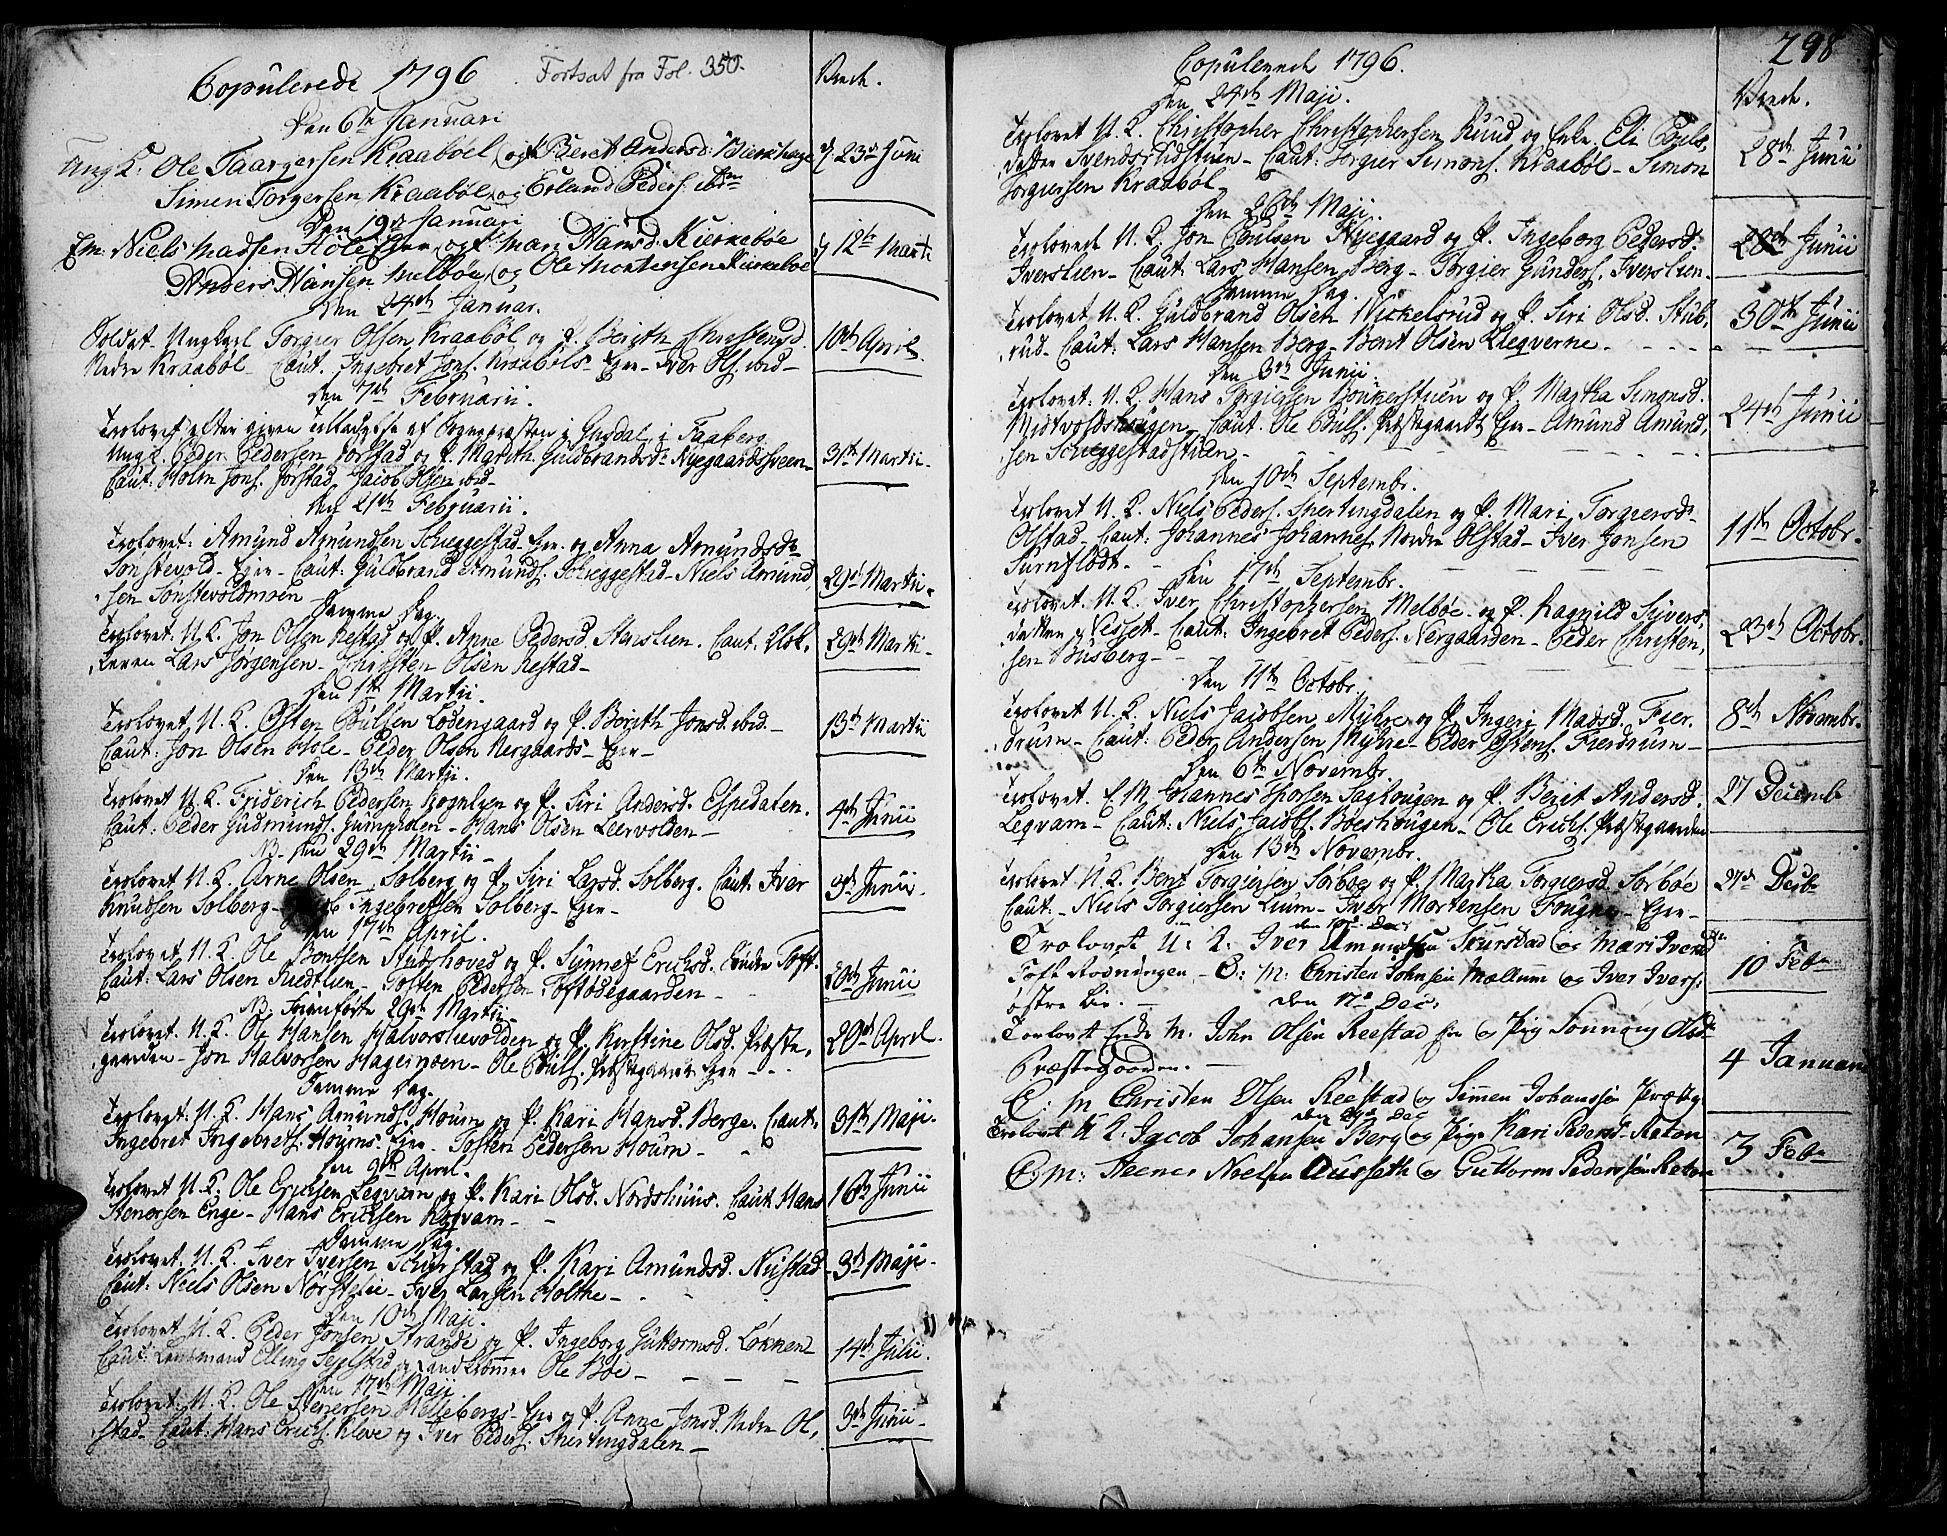 SAH, Gausdal prestekontor, Ministerialbok nr. 3, 1758-1809, s. 298